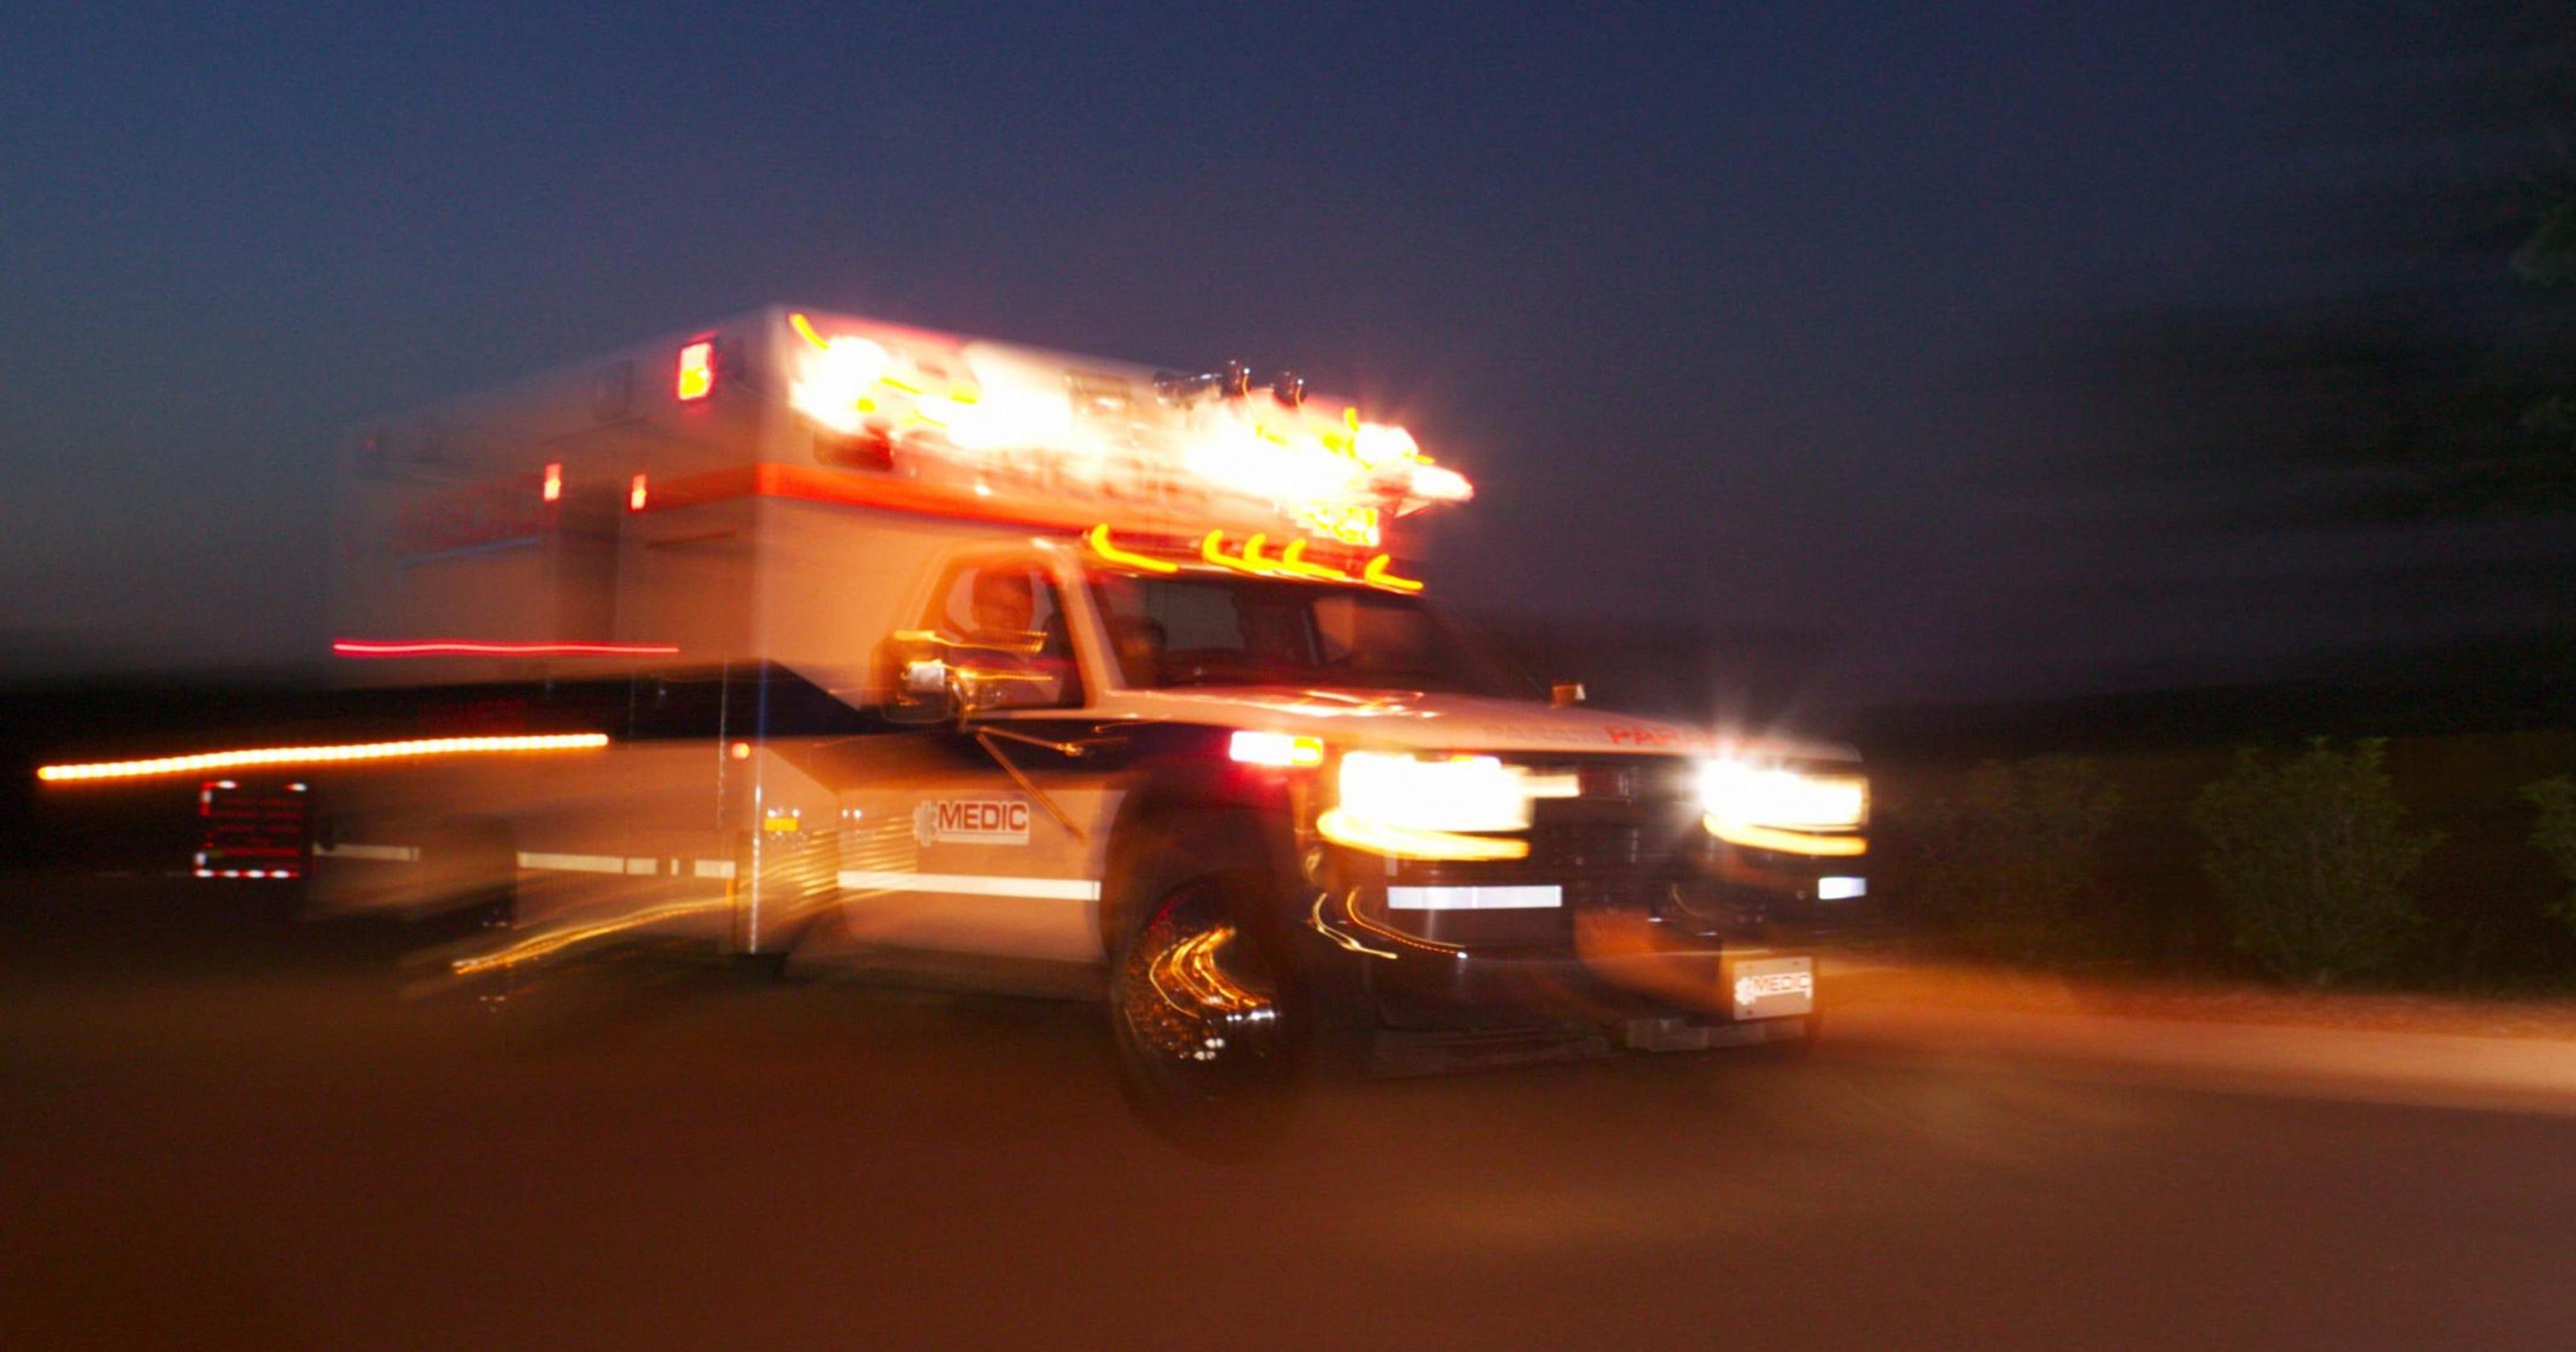 Montana deputy suffers burns while helping stranded motorist